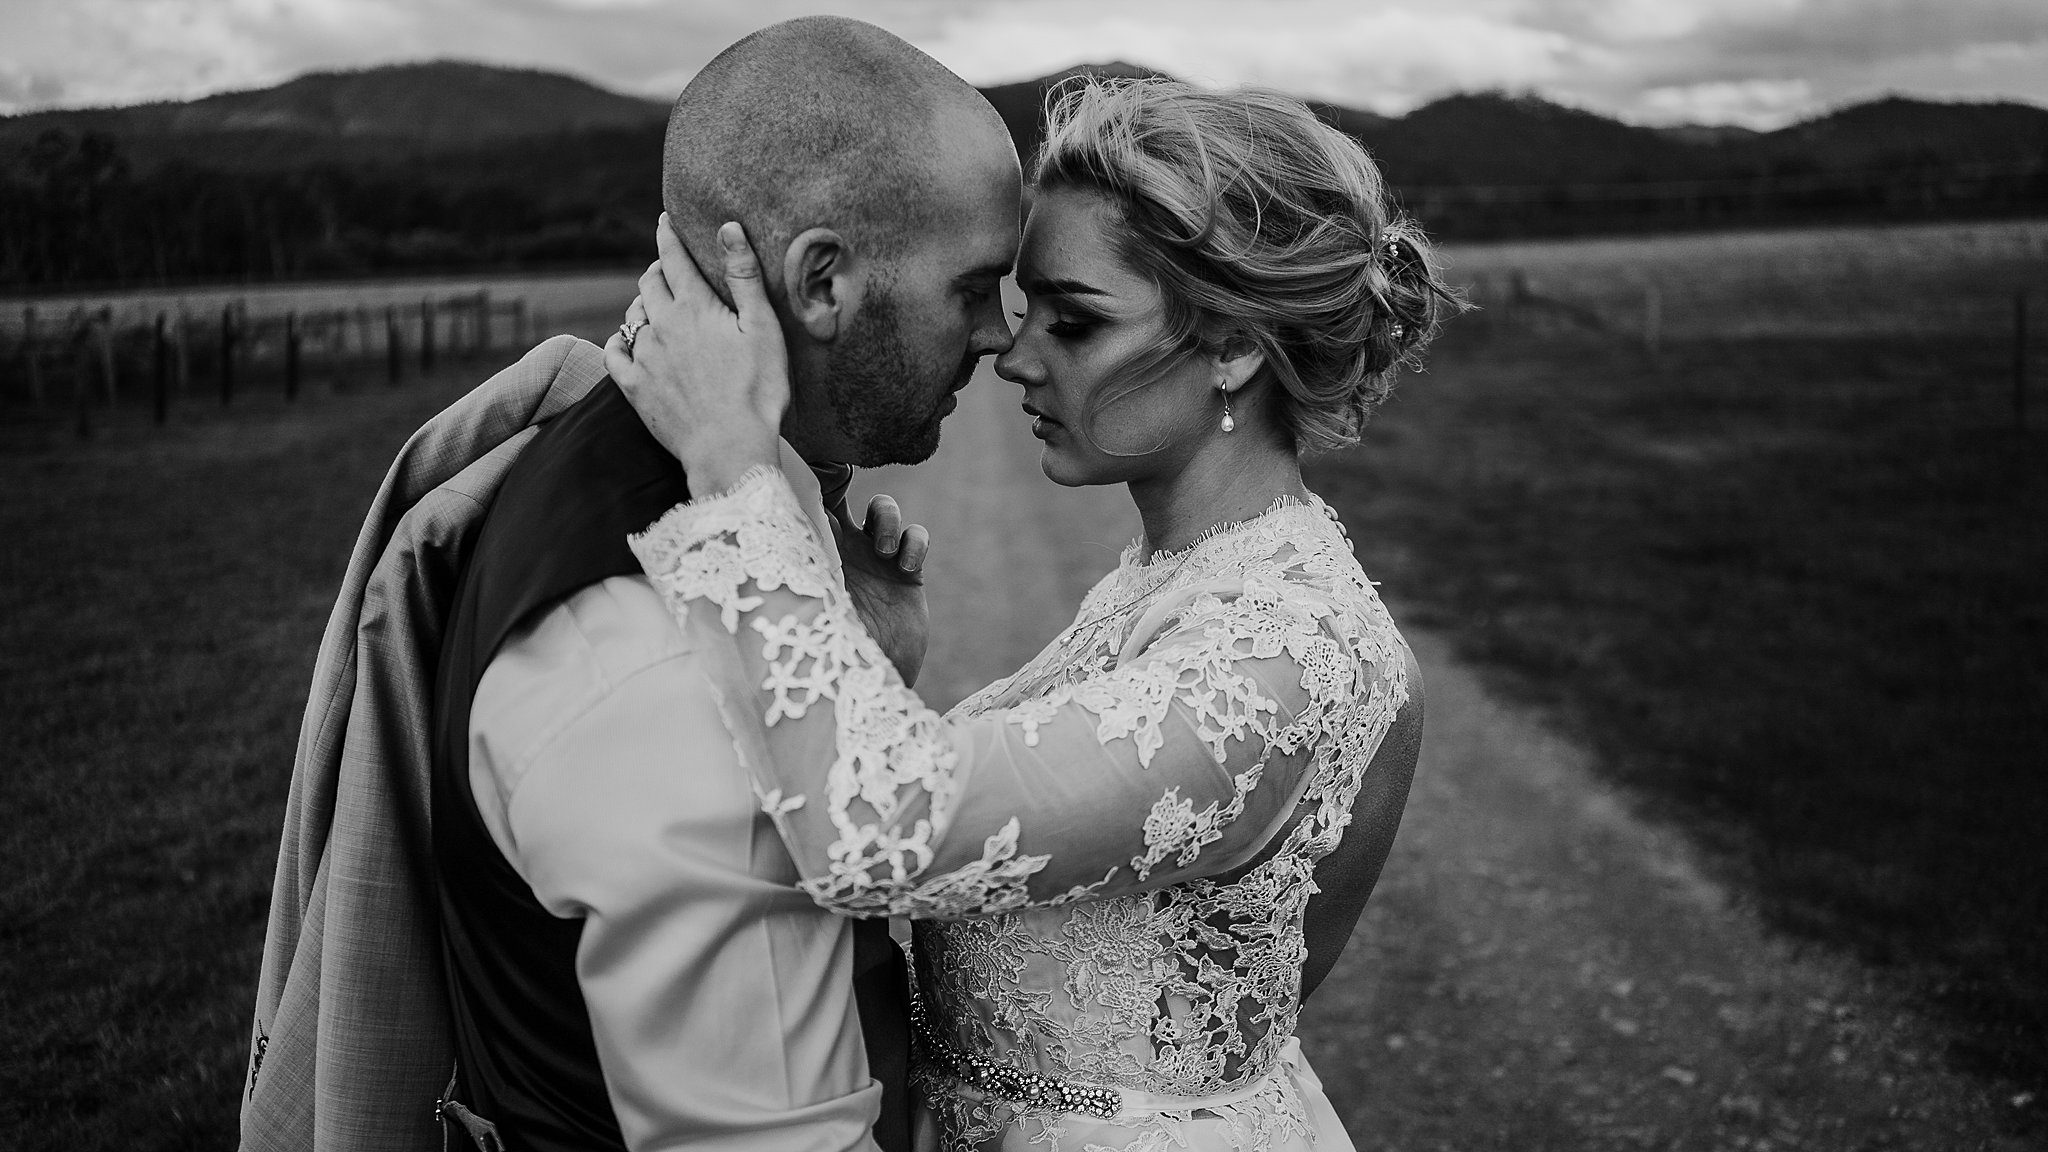 mickalathomas_puremacphotography_weddingphotographer_couplephotographer_Sheppartonphotographer_3461.jpg